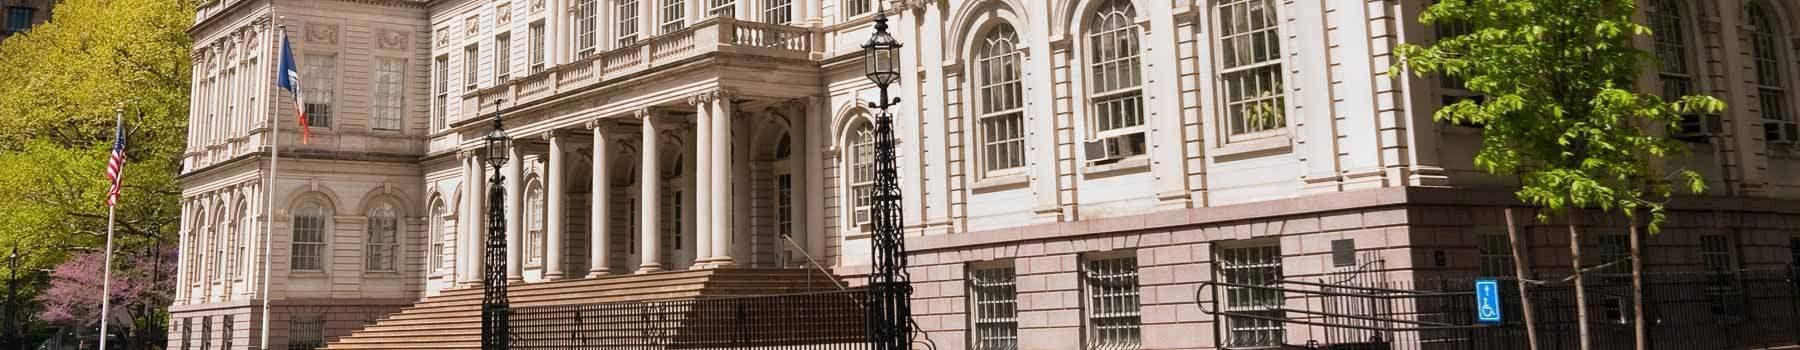 New York City Hall newyork top